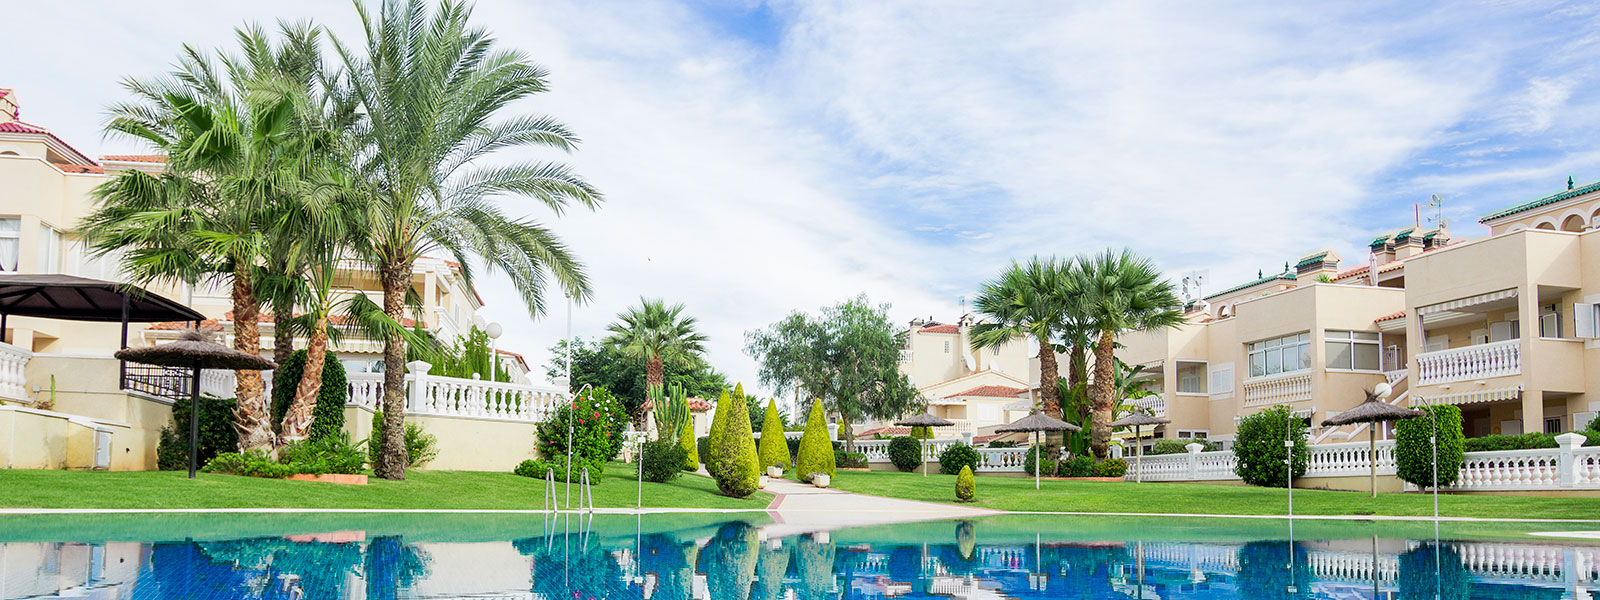 Garden solutions costa blanca - Swimming pool repairs costa blanca ...